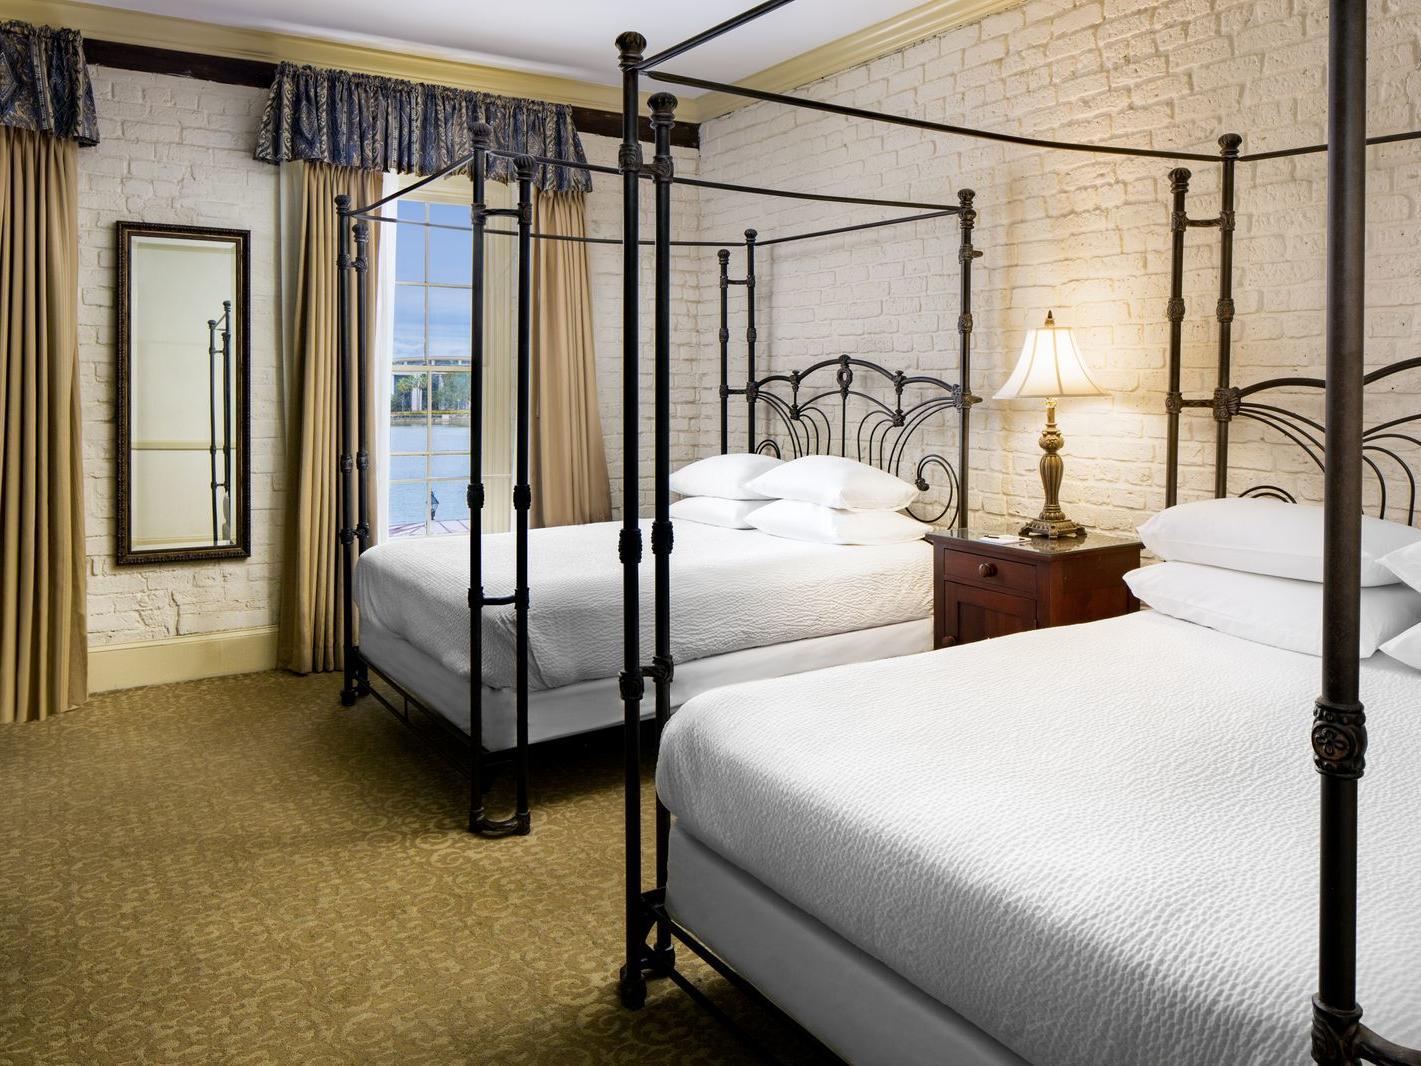 Amazing River Street Inn Hotels On River Street In Savannah Ga Download Free Architecture Designs Licukmadebymaigaardcom